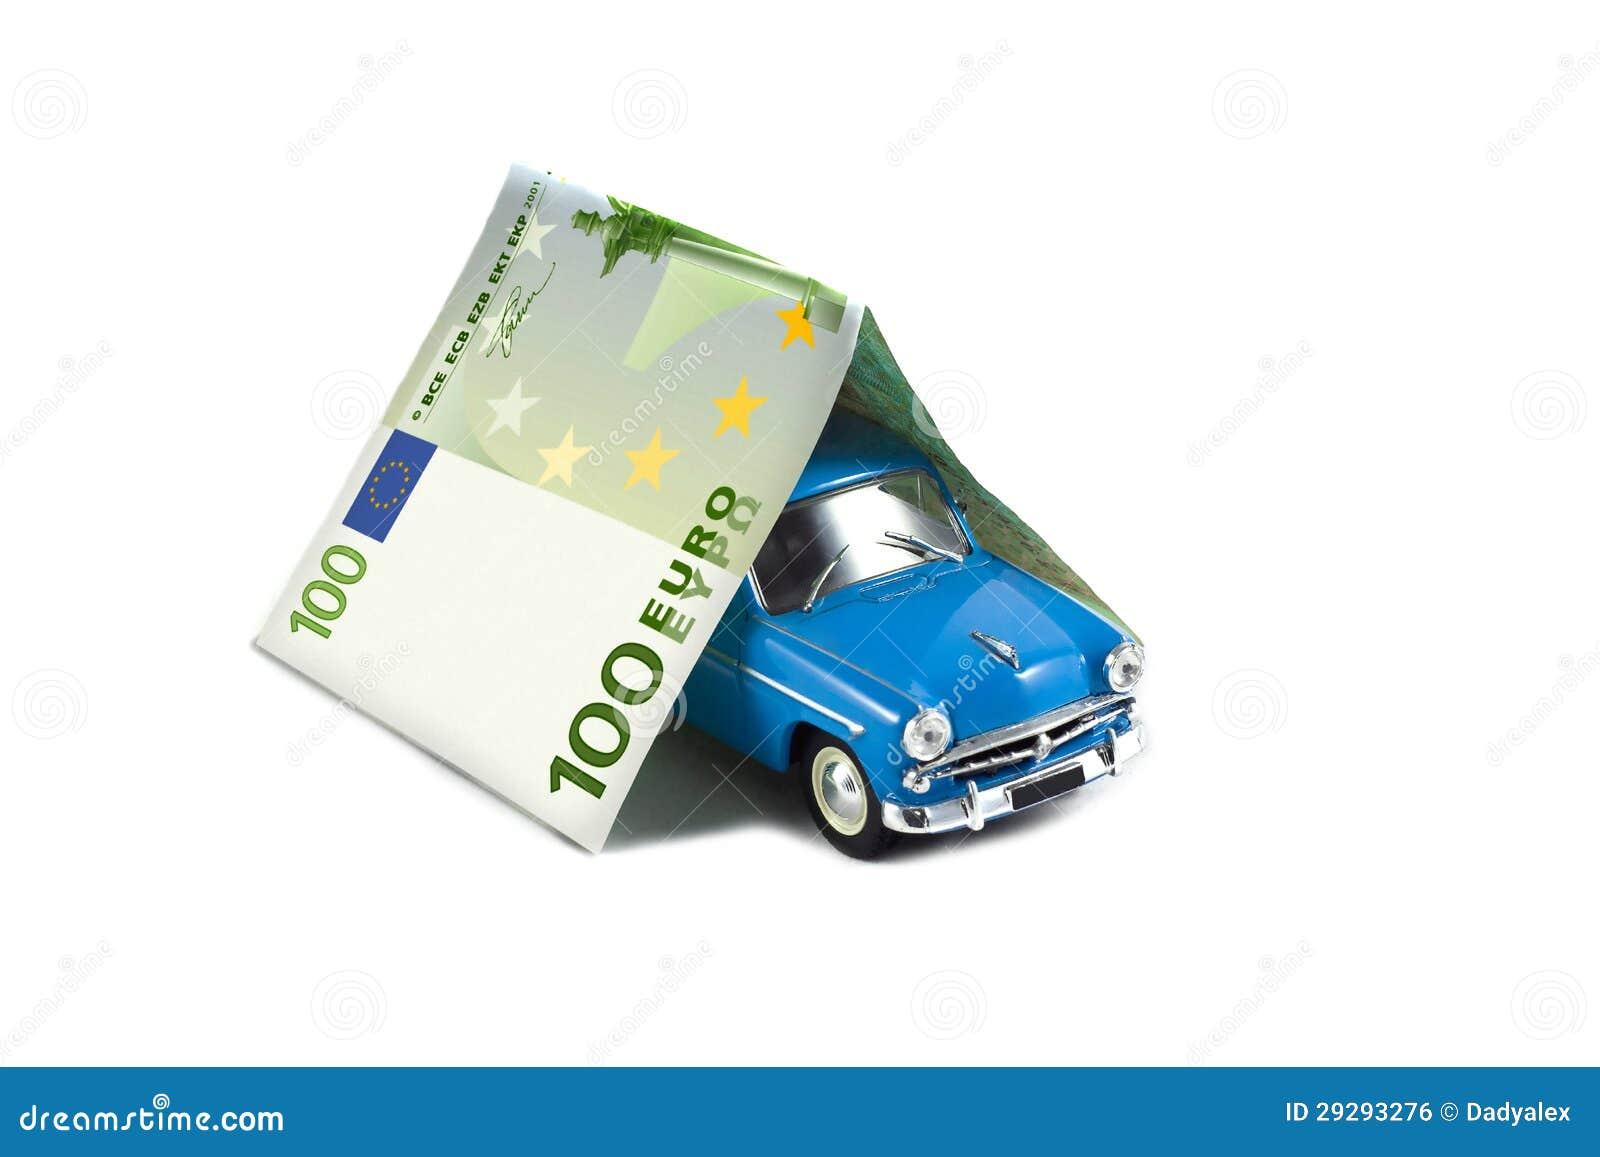 Auto Loan Royalty Free Stock Image - Image: 29293276